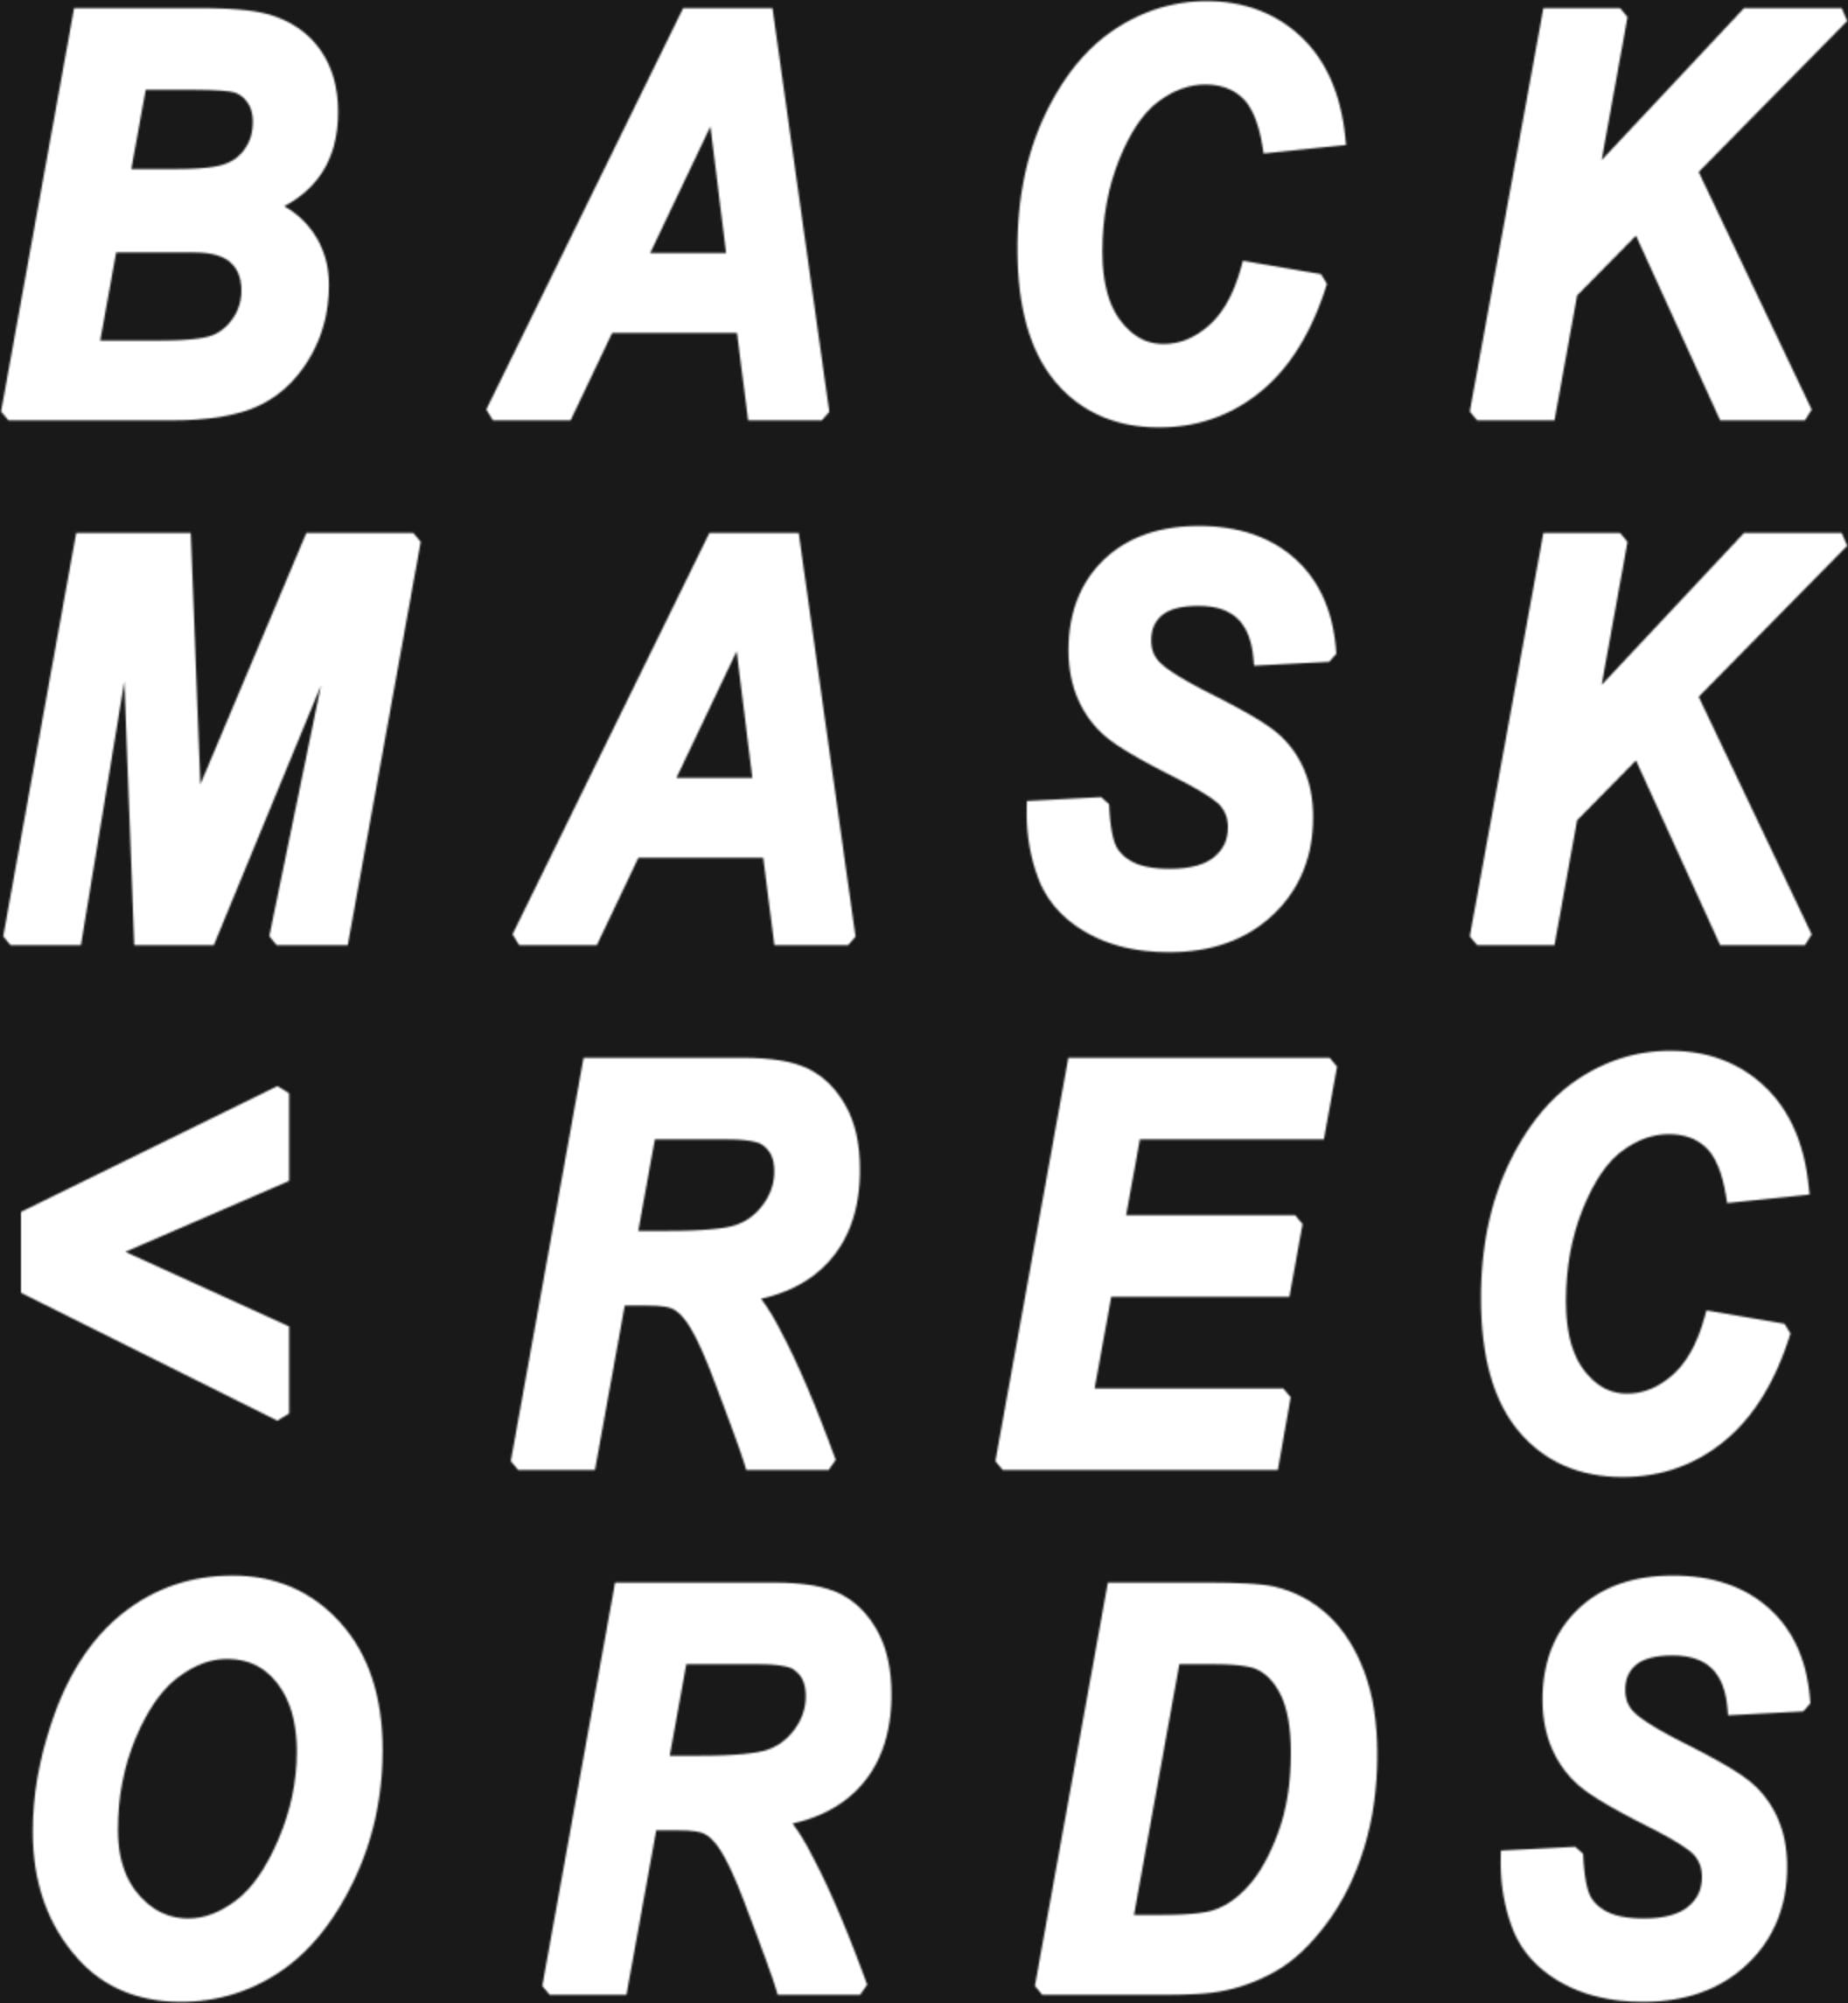 Backmask records logo backmask records logo 1528225757